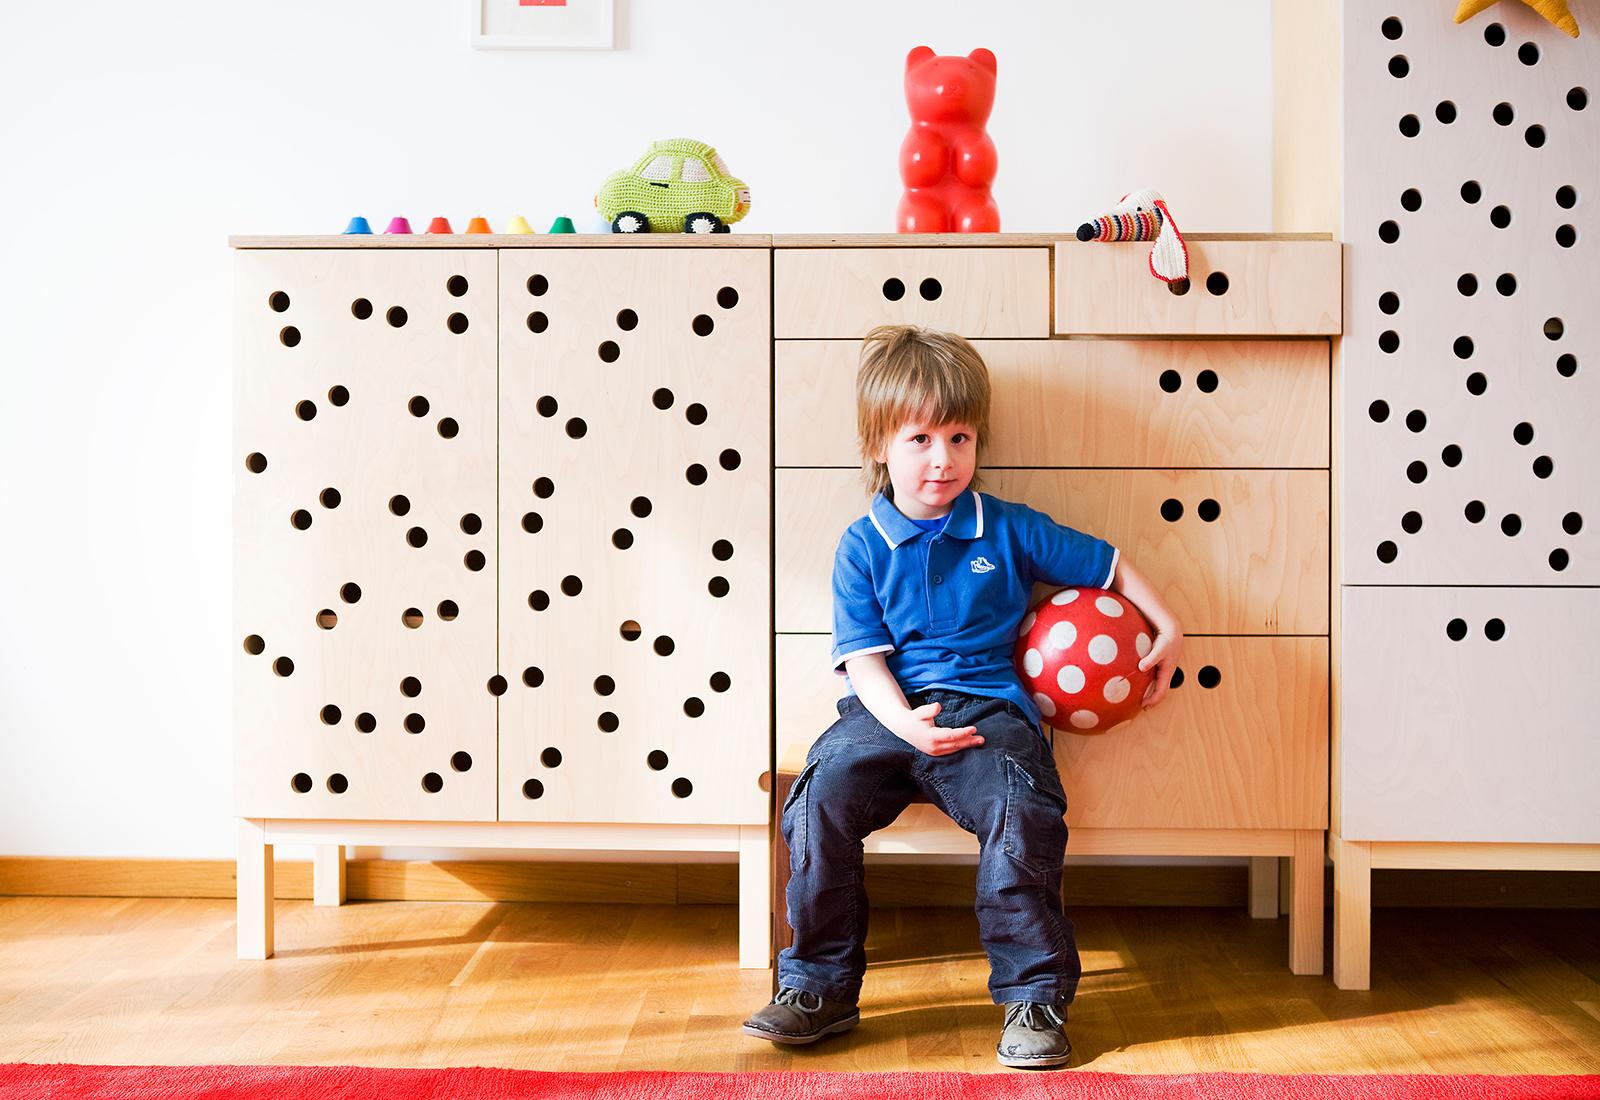 SIXKID kid's furniture